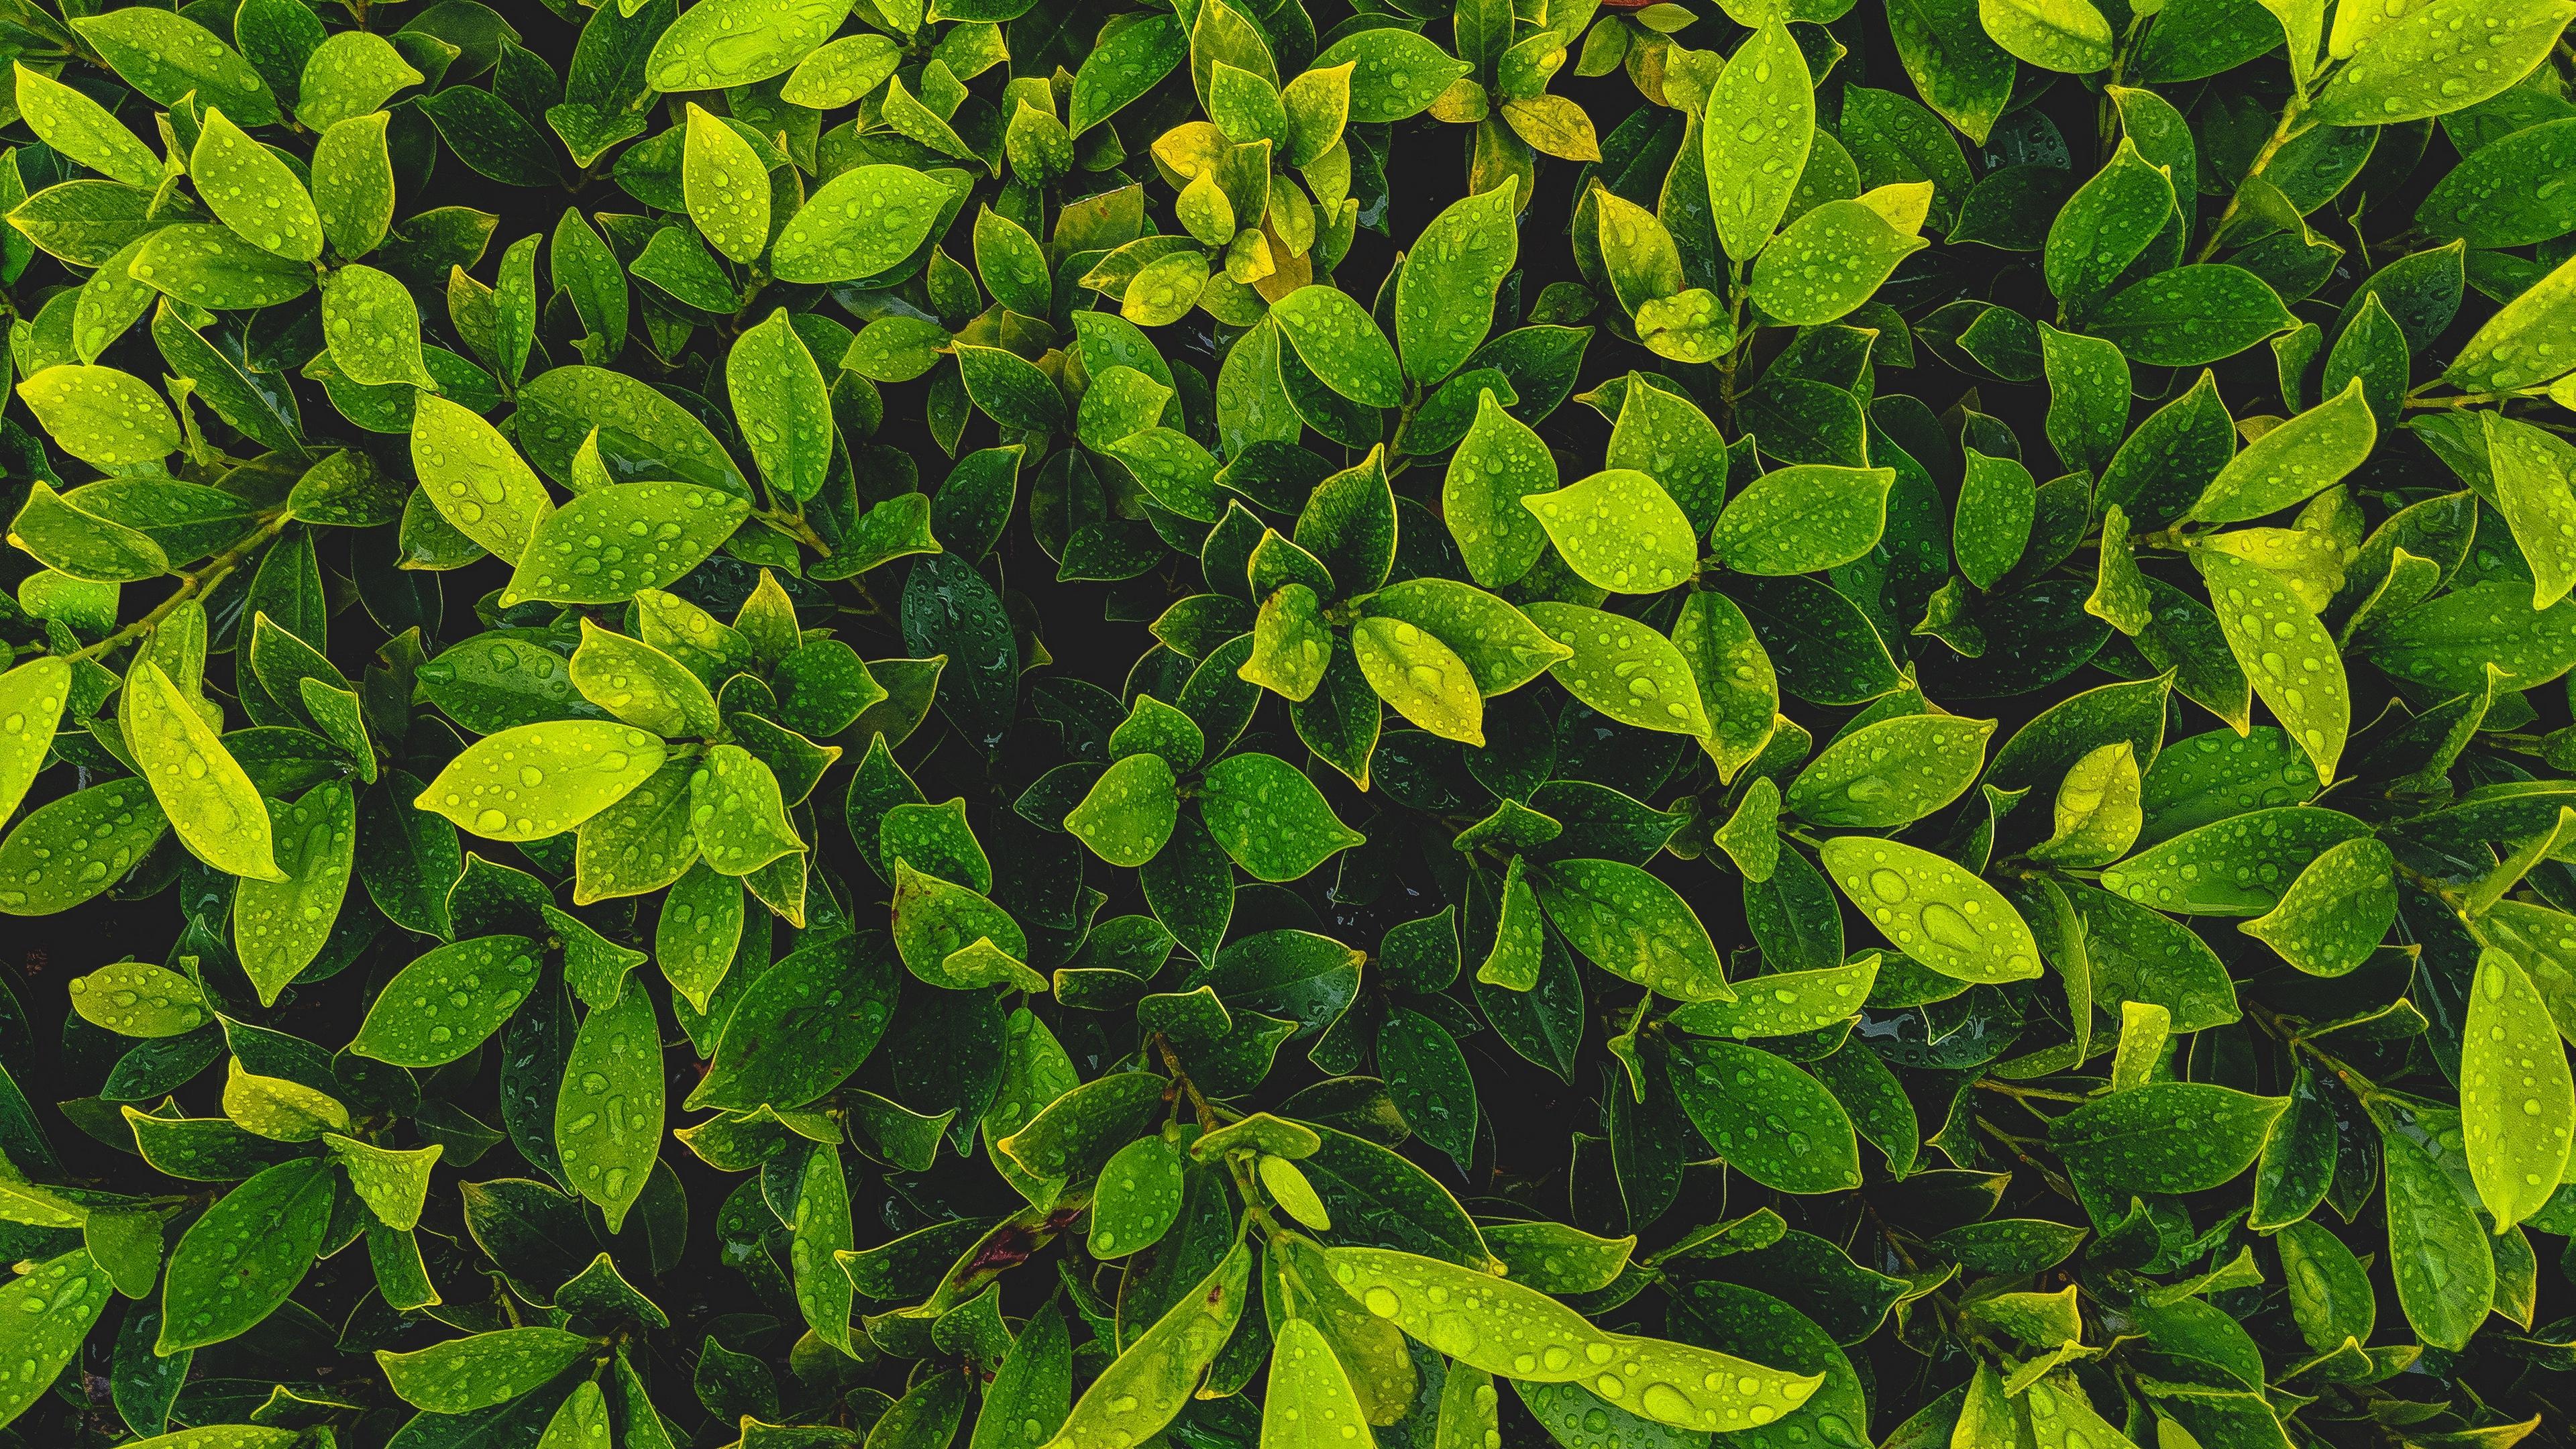 leaves plant drops green 4k 1541115412 - leaves, plant, drops, green 4k - Plant, Leaves, Drops